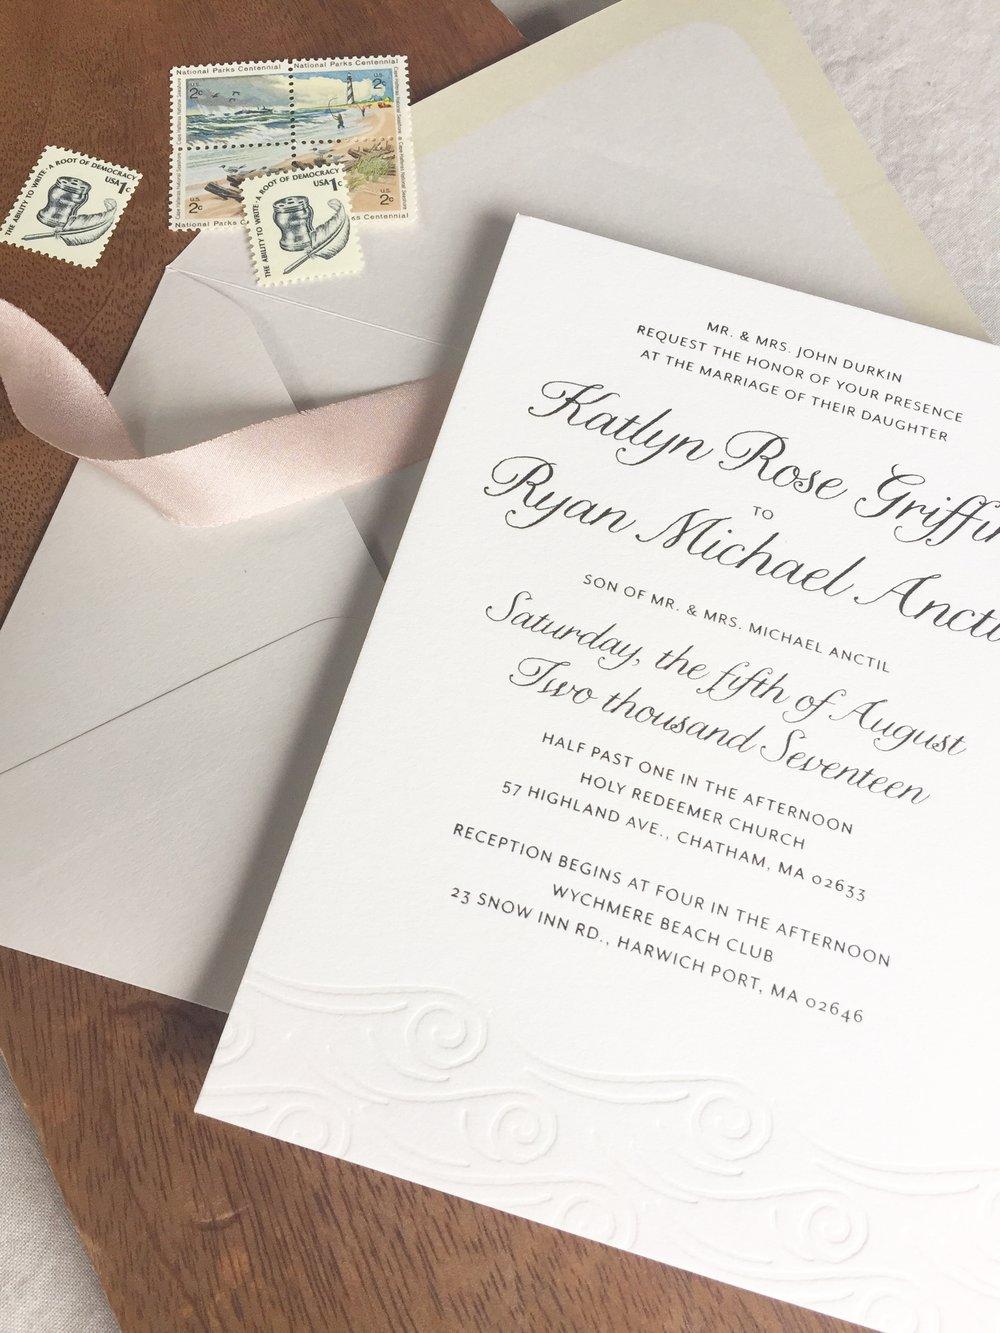 Maria_Bond_Design_Cape_Cod_Wedding_Invite_Katlyn_1.jpg